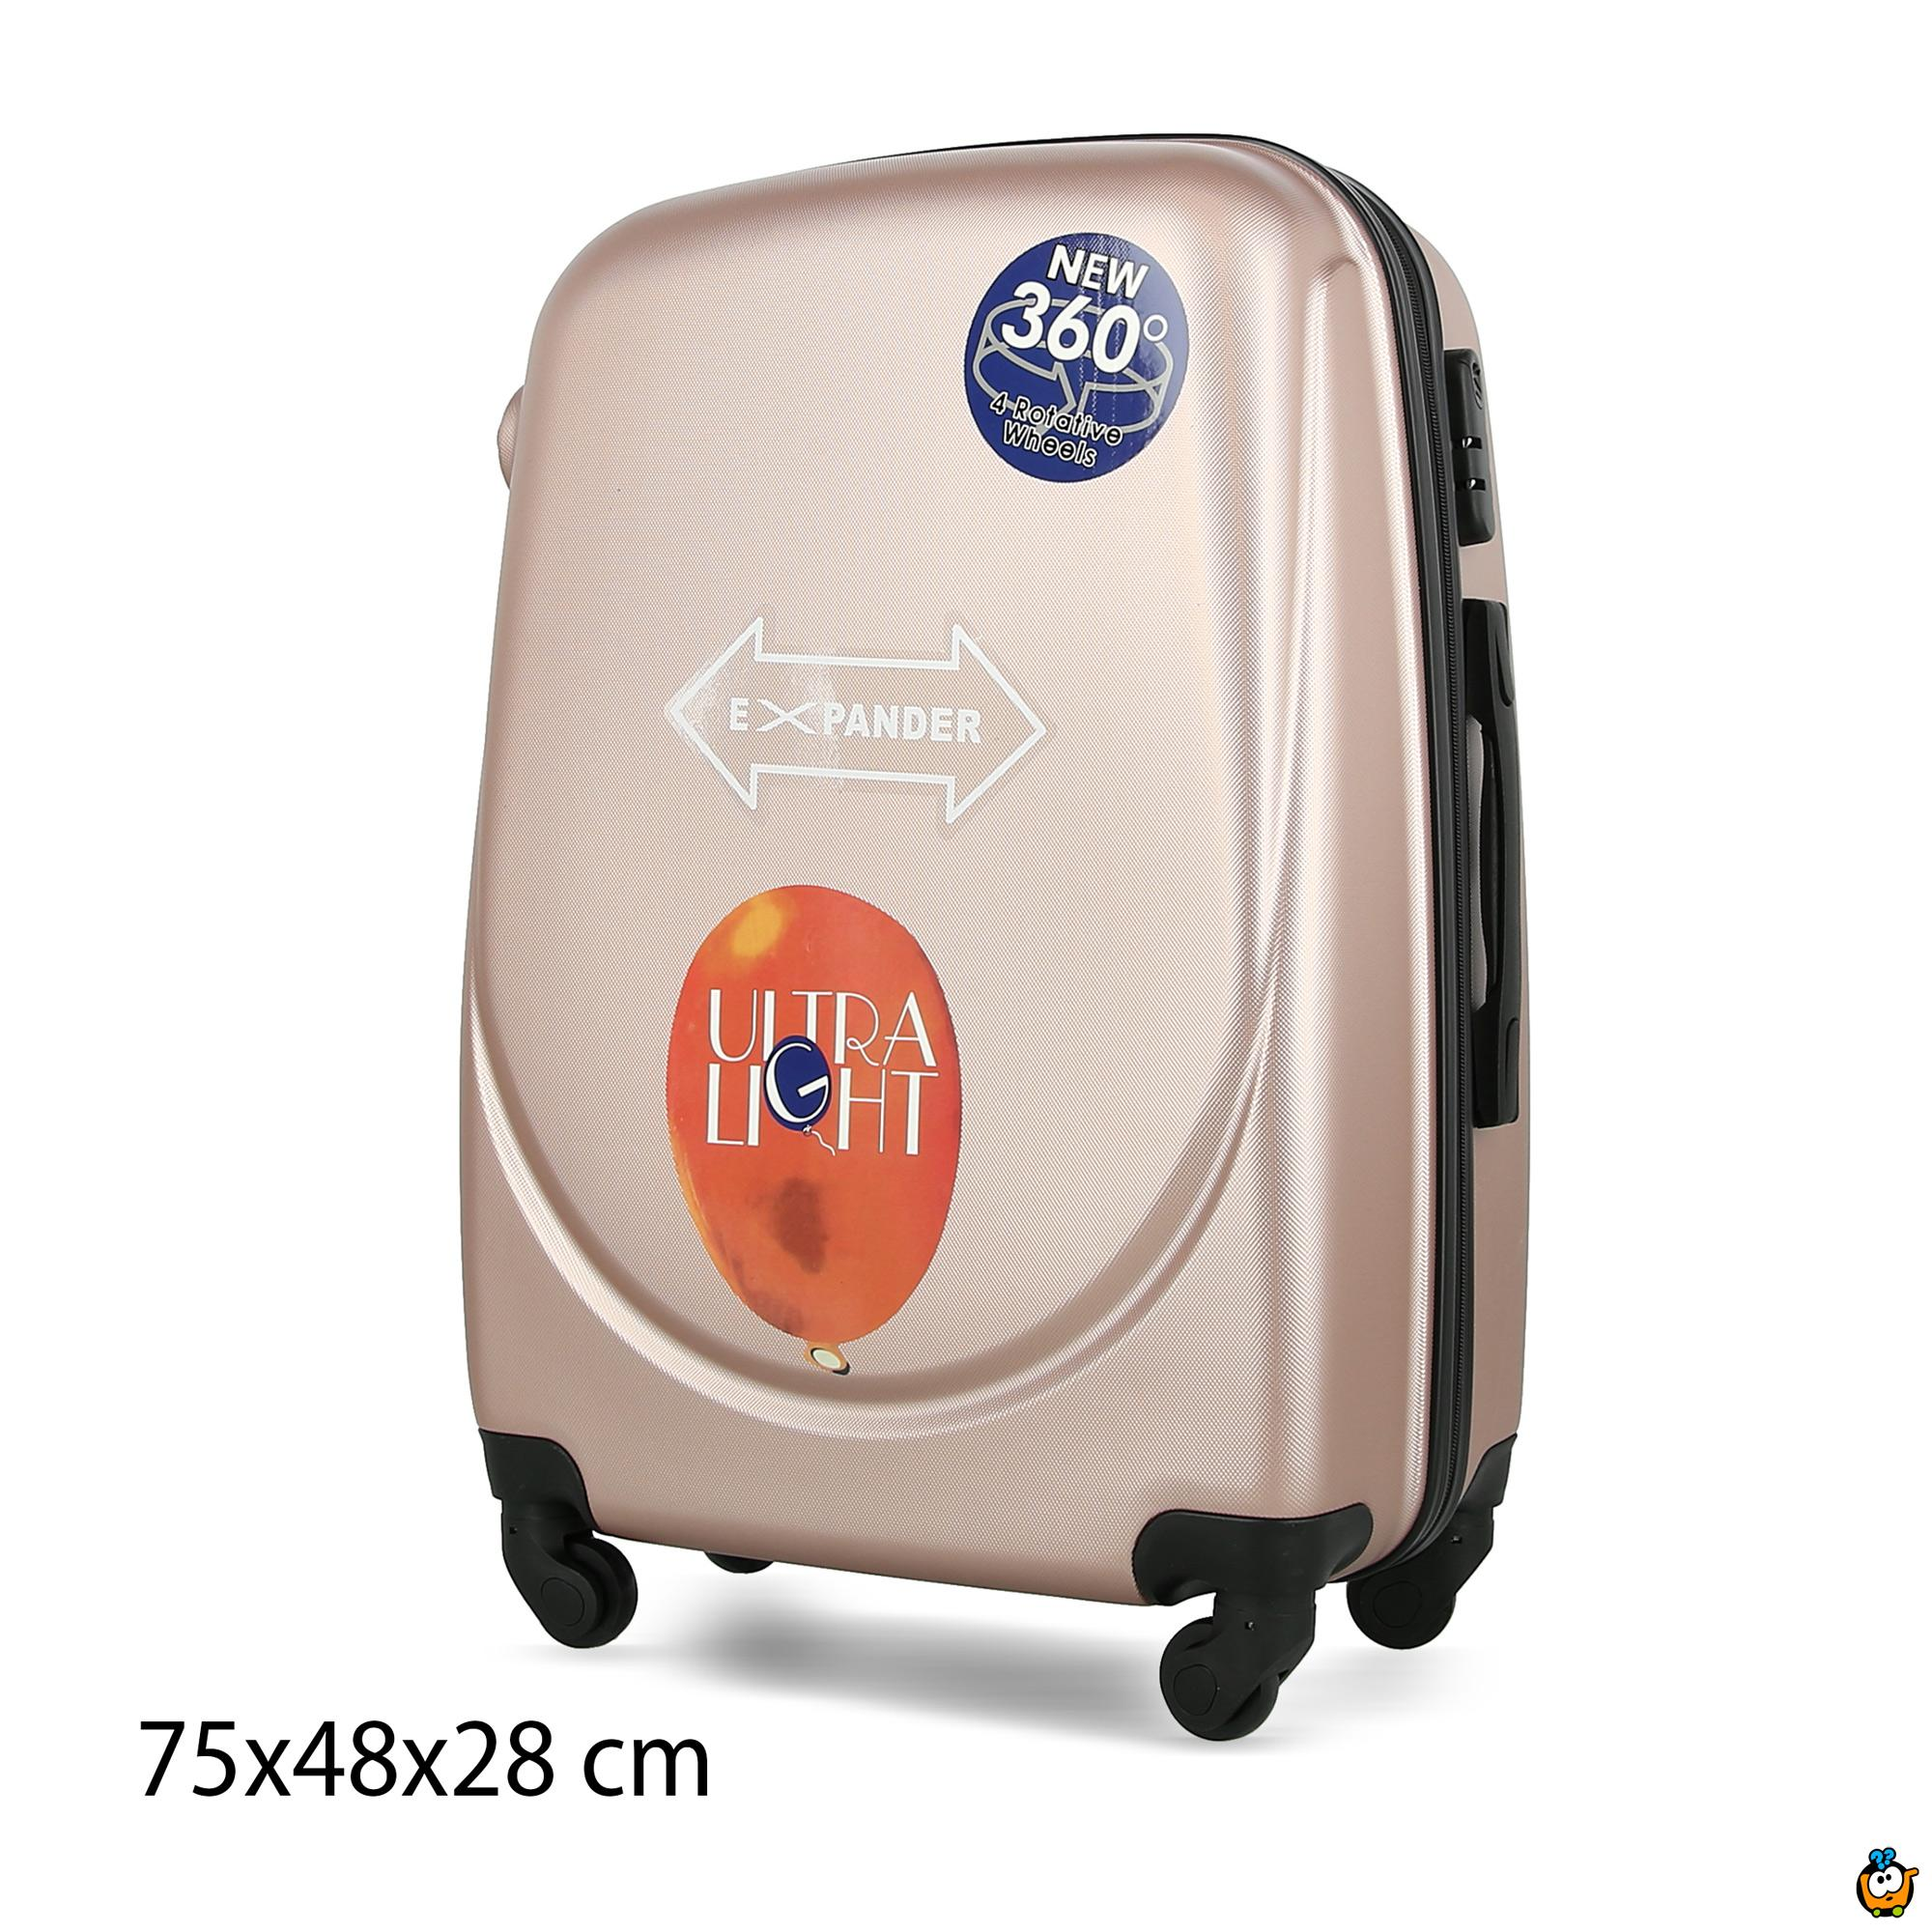 Putni kofer Expandable sa točkićima 360° -  PINK XL